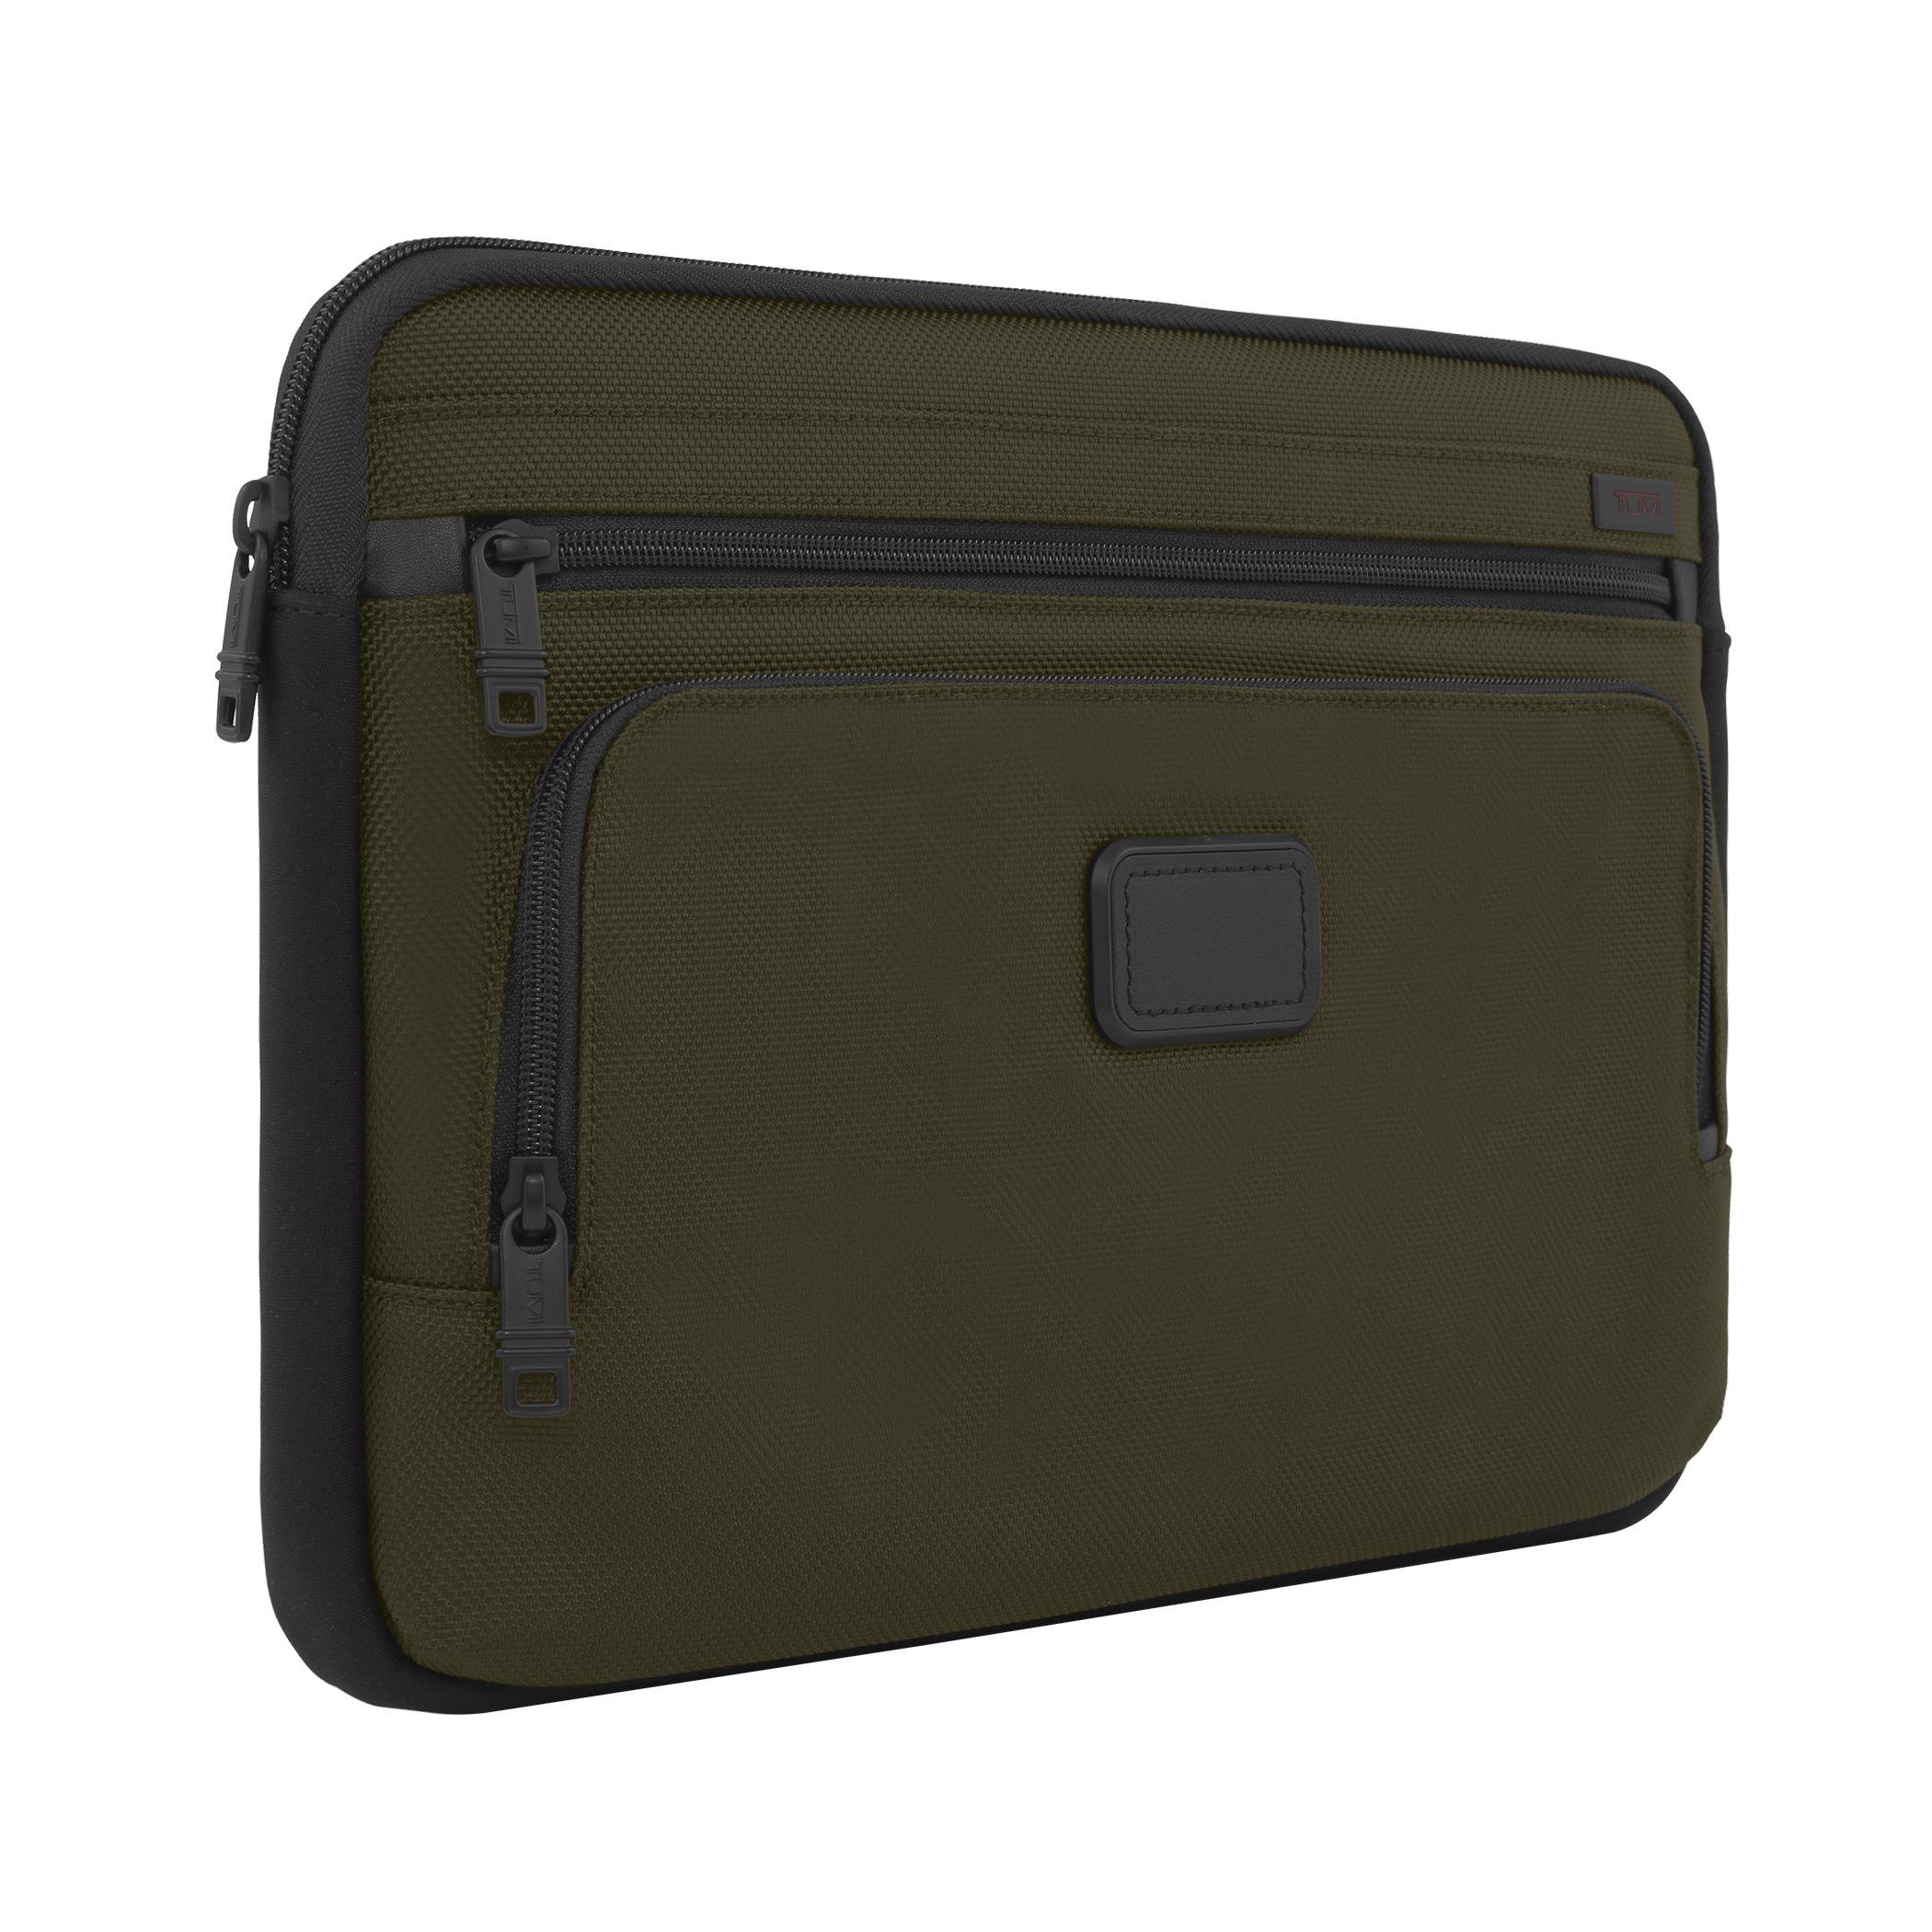 TUMI Laptop Cover for 13'' Laptops - Ballistic Nylon Olive by Incipio (Image #3)